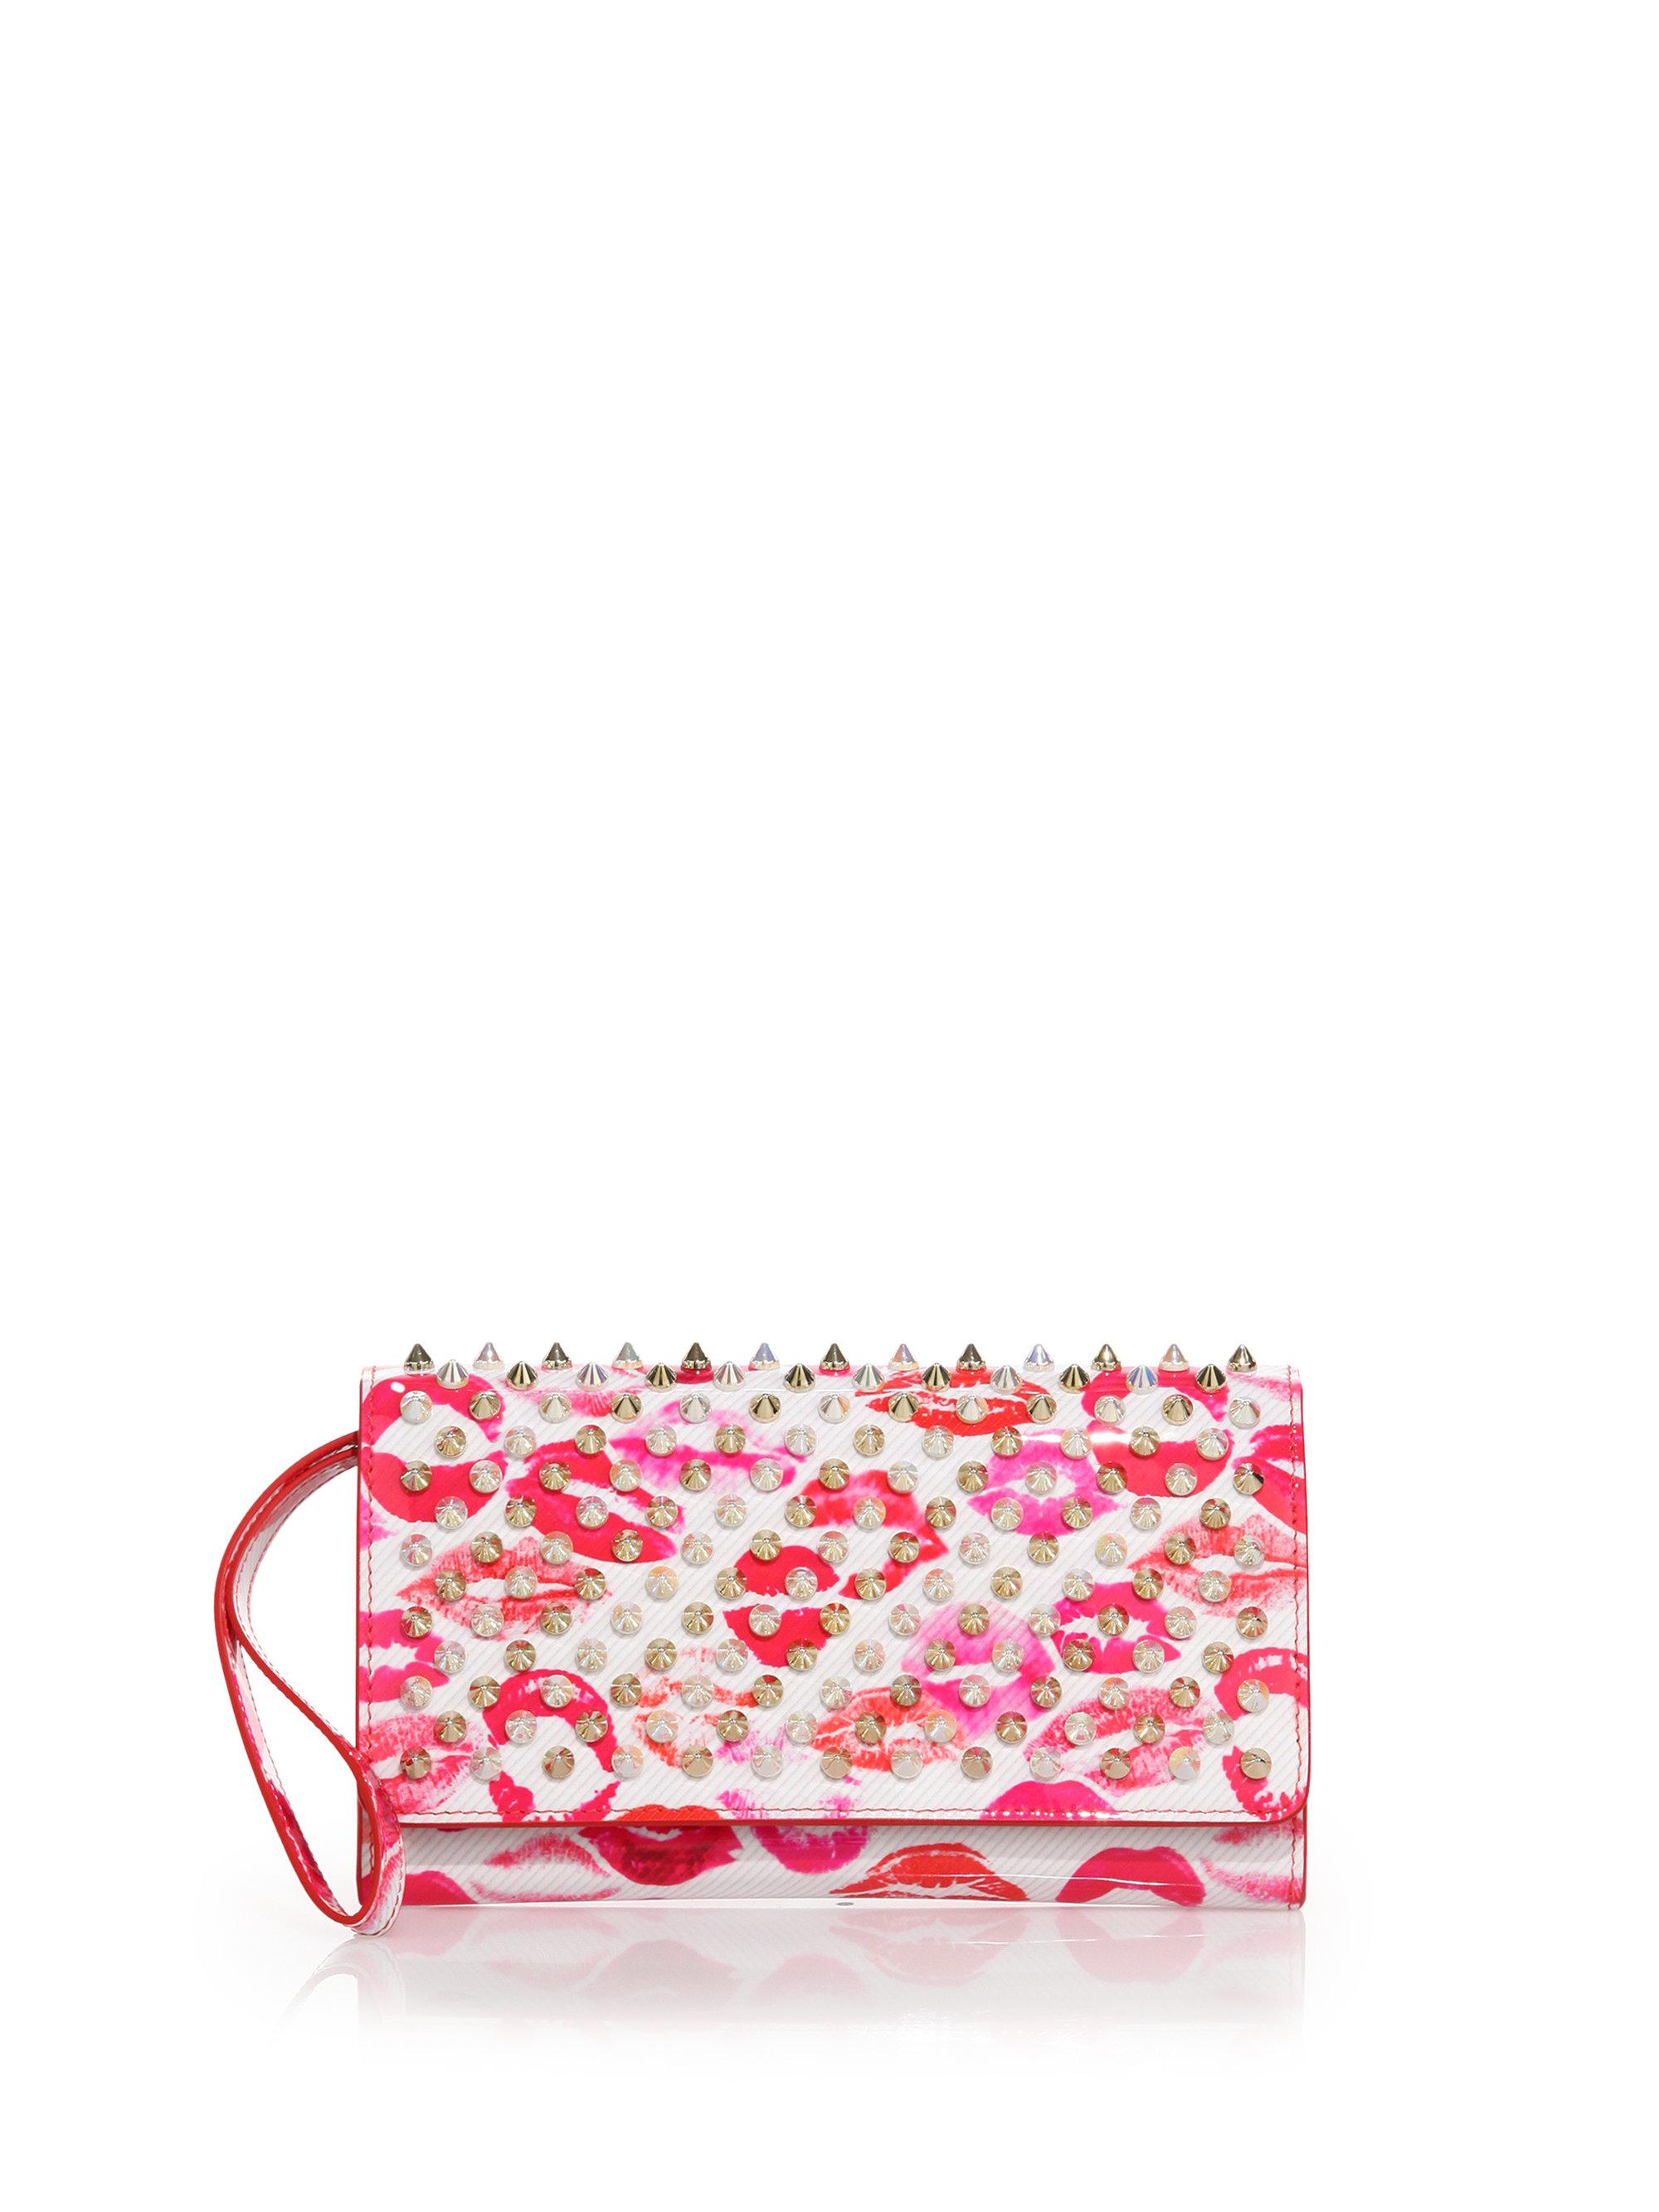 645eaec71c9 Christian Louboutin Pink Macaron Lips Studded Leather Wallet